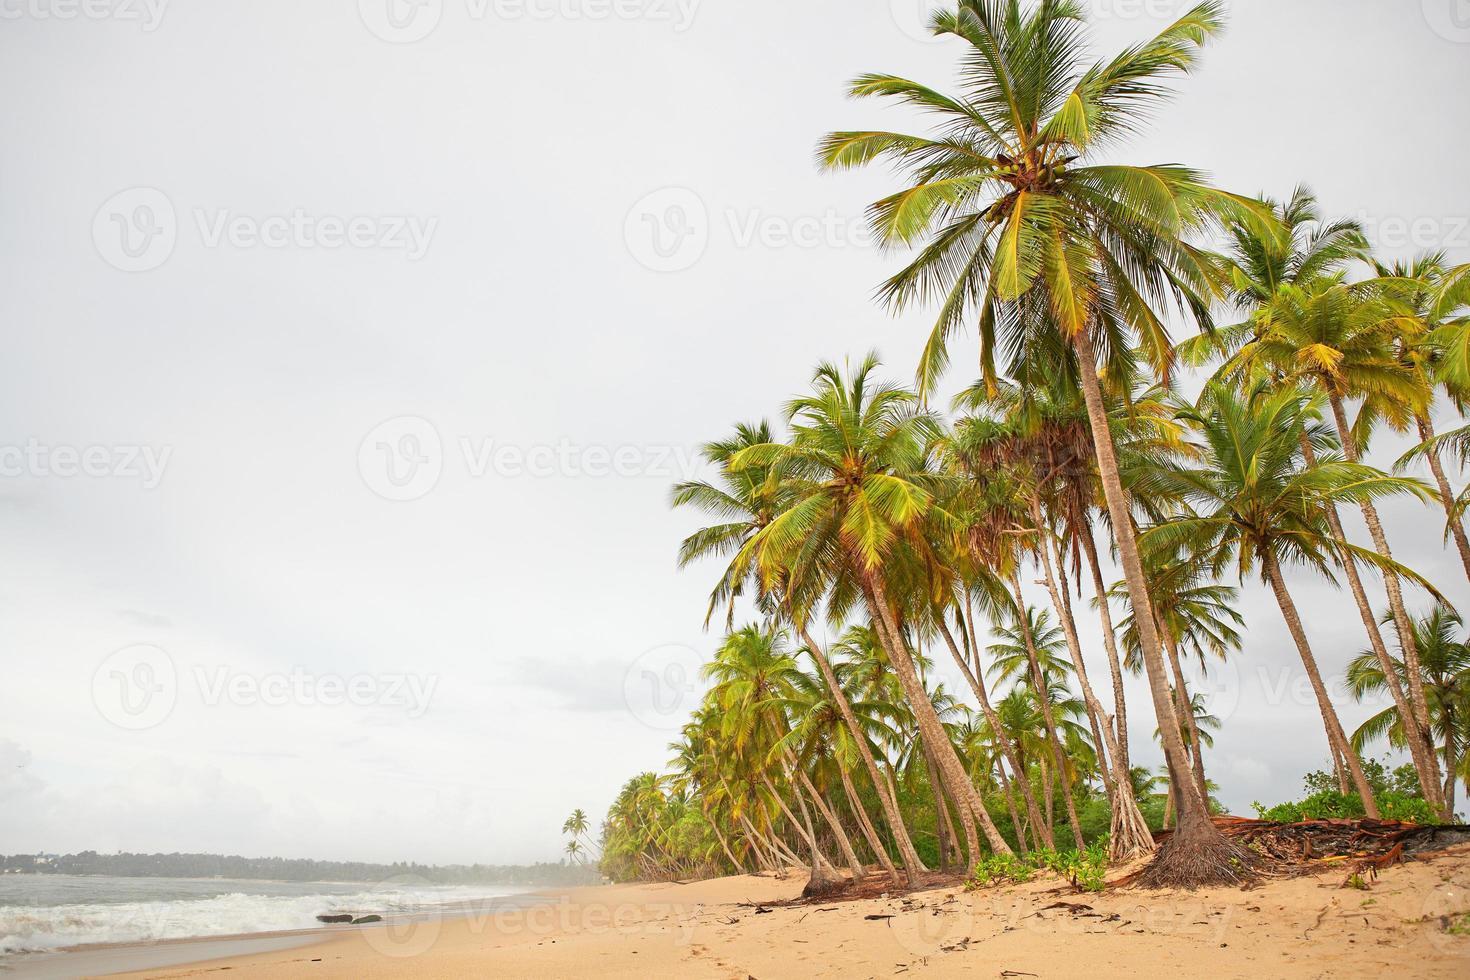 Rainy day on a tropical island photo